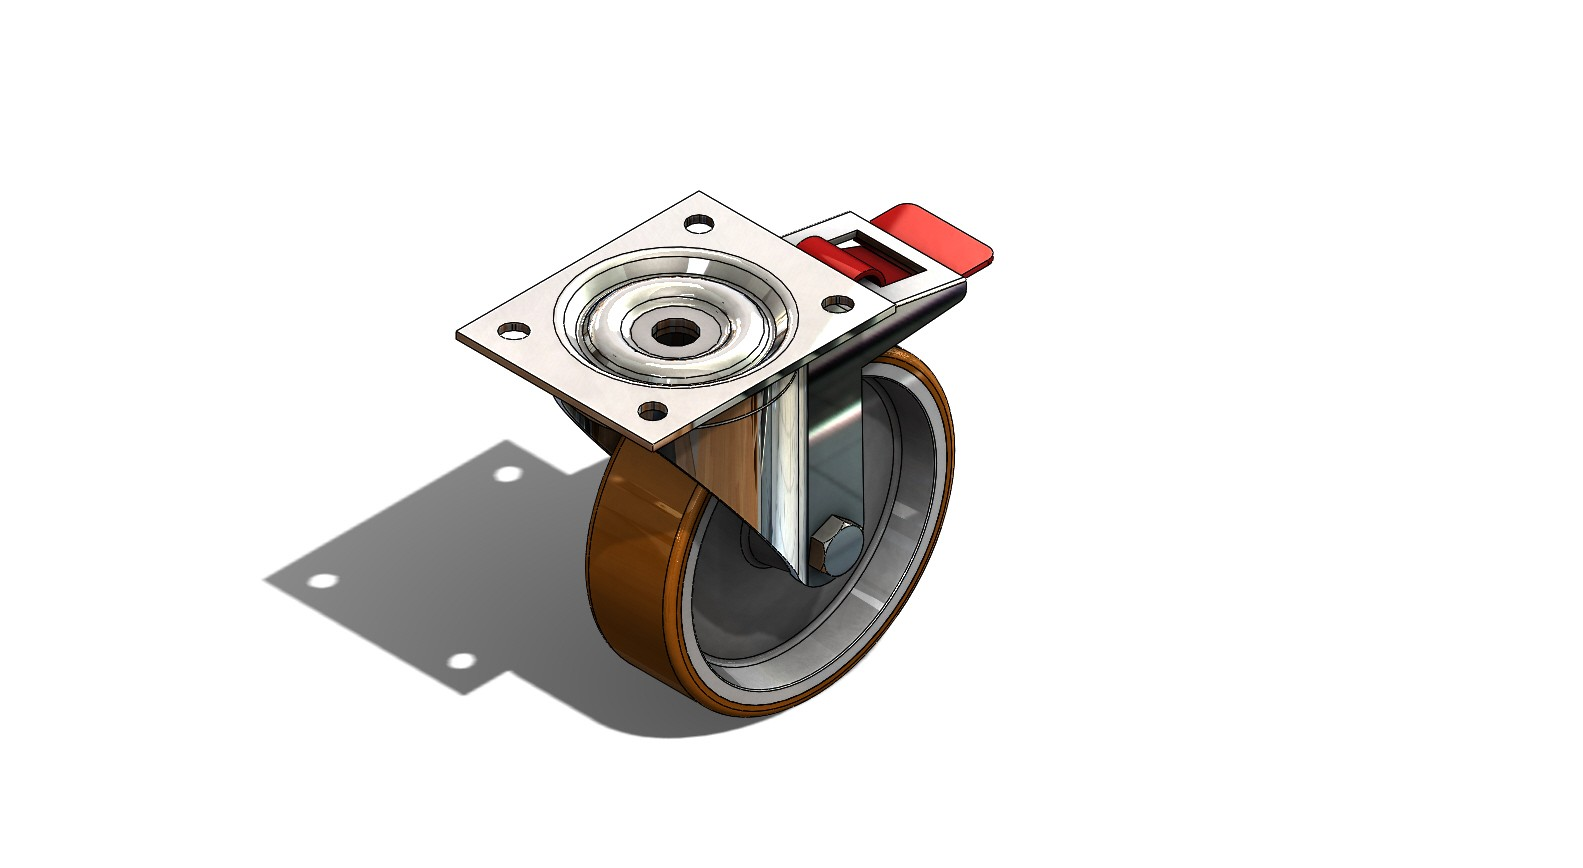 SolidWorks模型免费下载:推车车轮